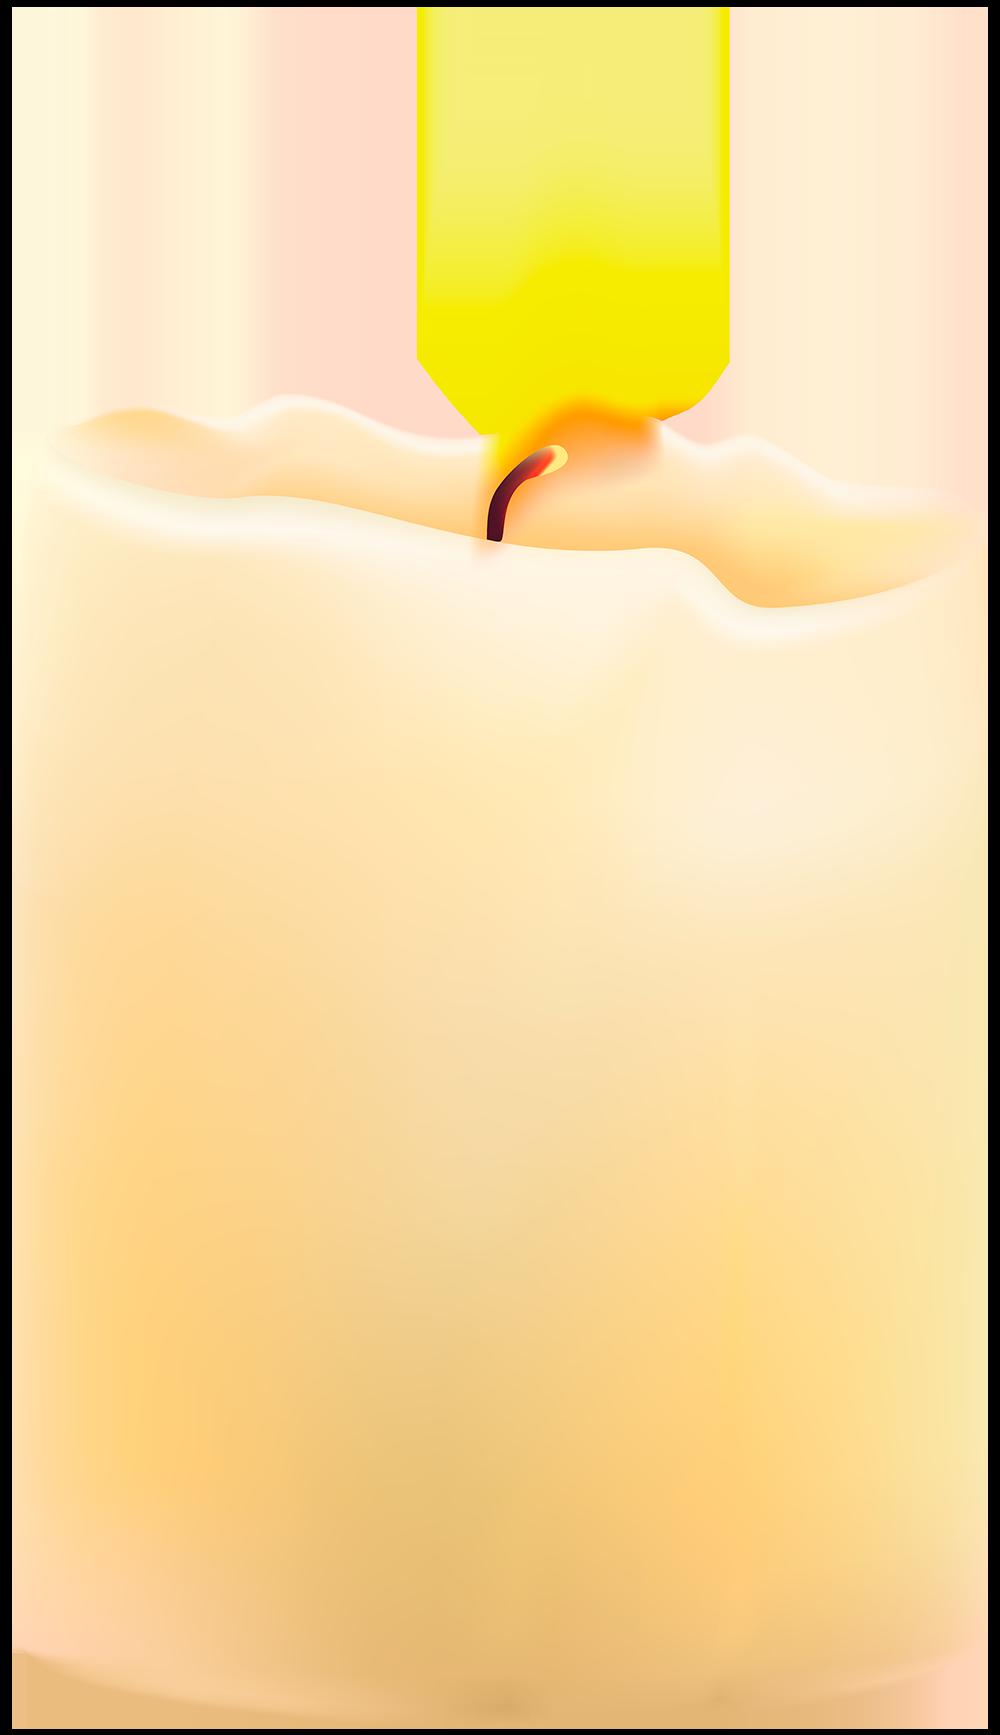 Свечка (свеча) - свечка, свеча